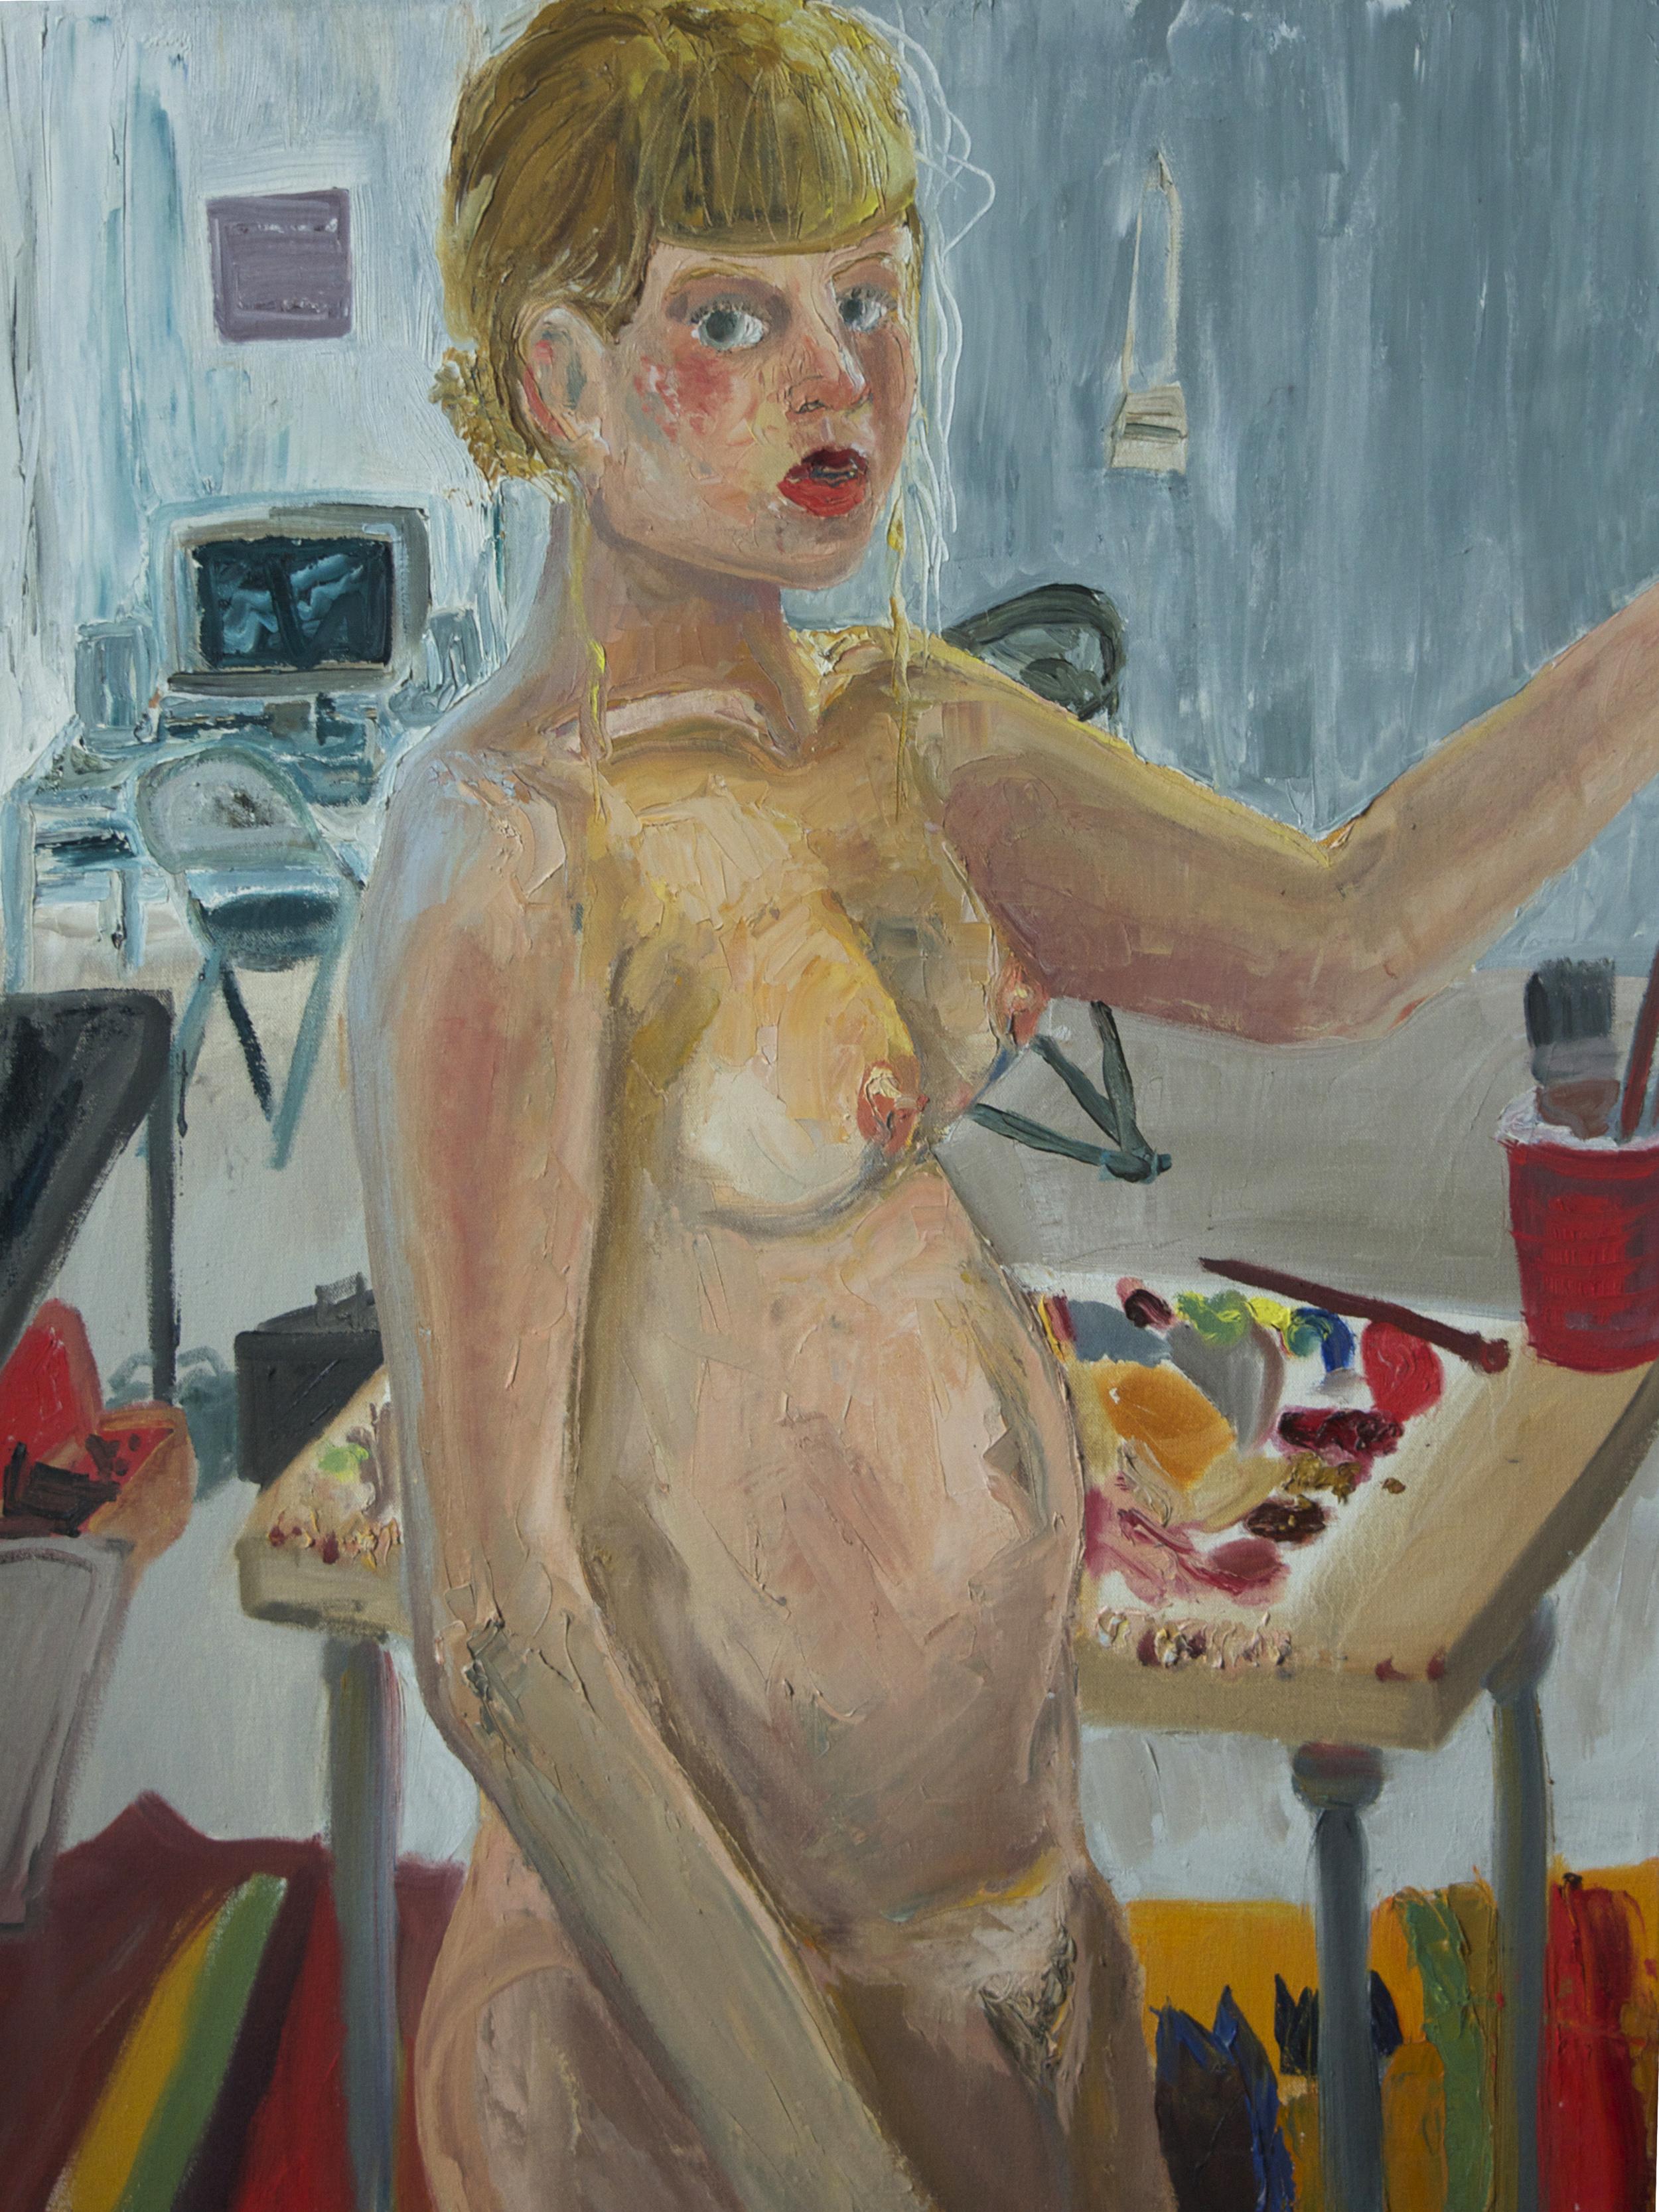 Self Portrait (Naked). Oil. 2014